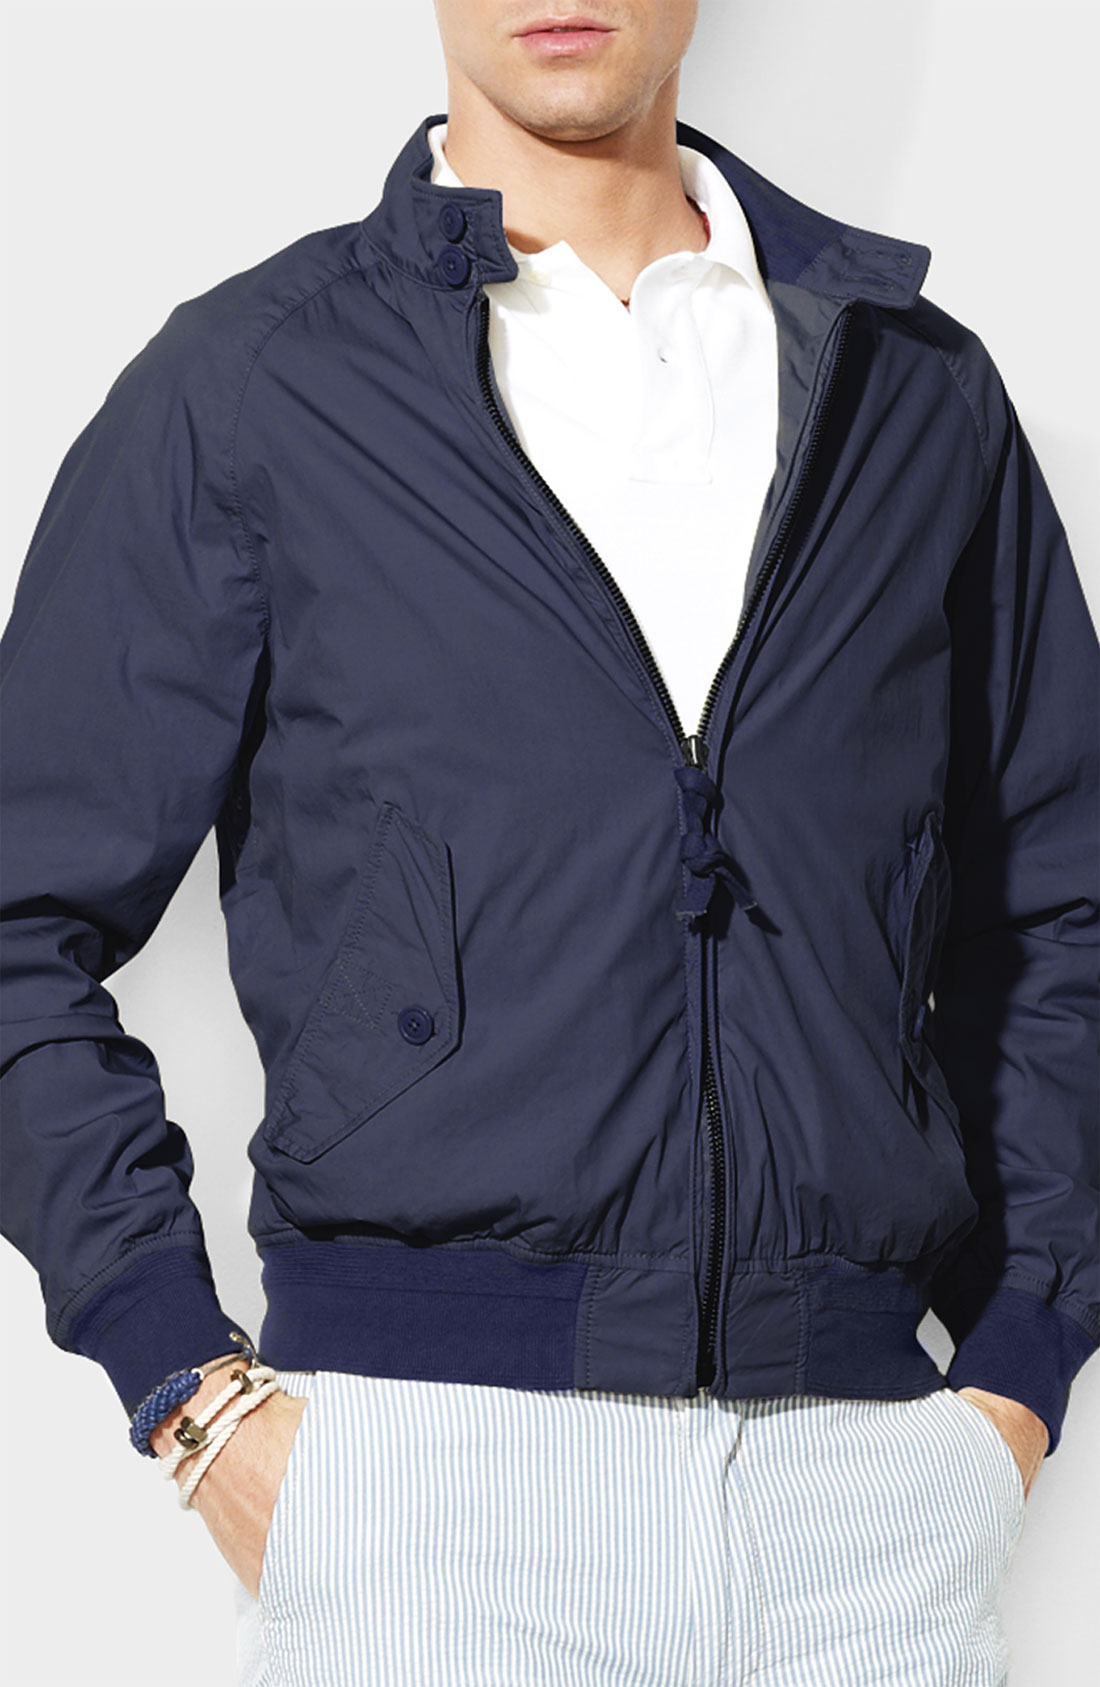 polo ralph lauren barracuda jacket in blue for men lyst. Black Bedroom Furniture Sets. Home Design Ideas